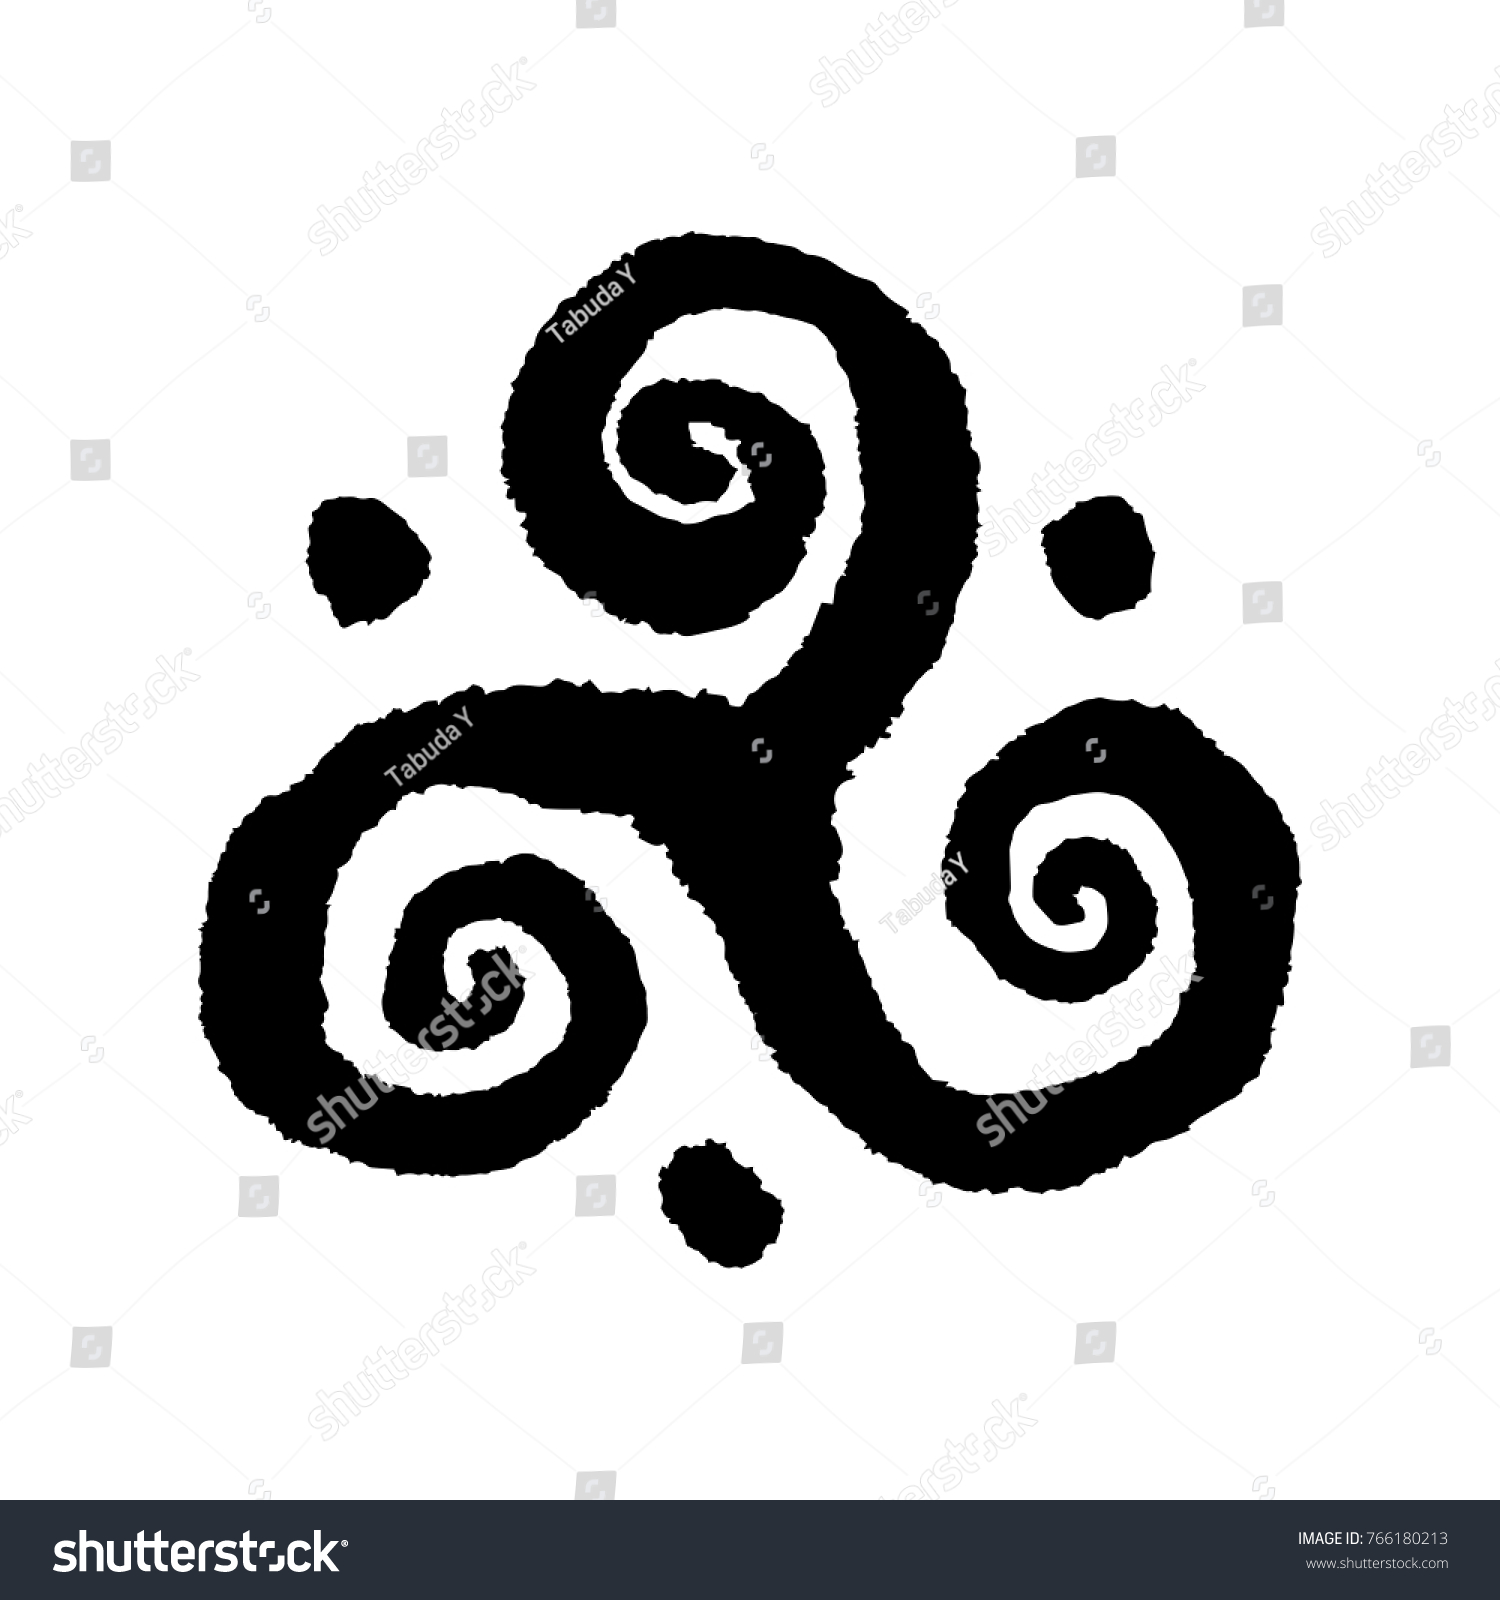 Triskele Buddhist Triple Spiral Symbol Handmade Stock Vector